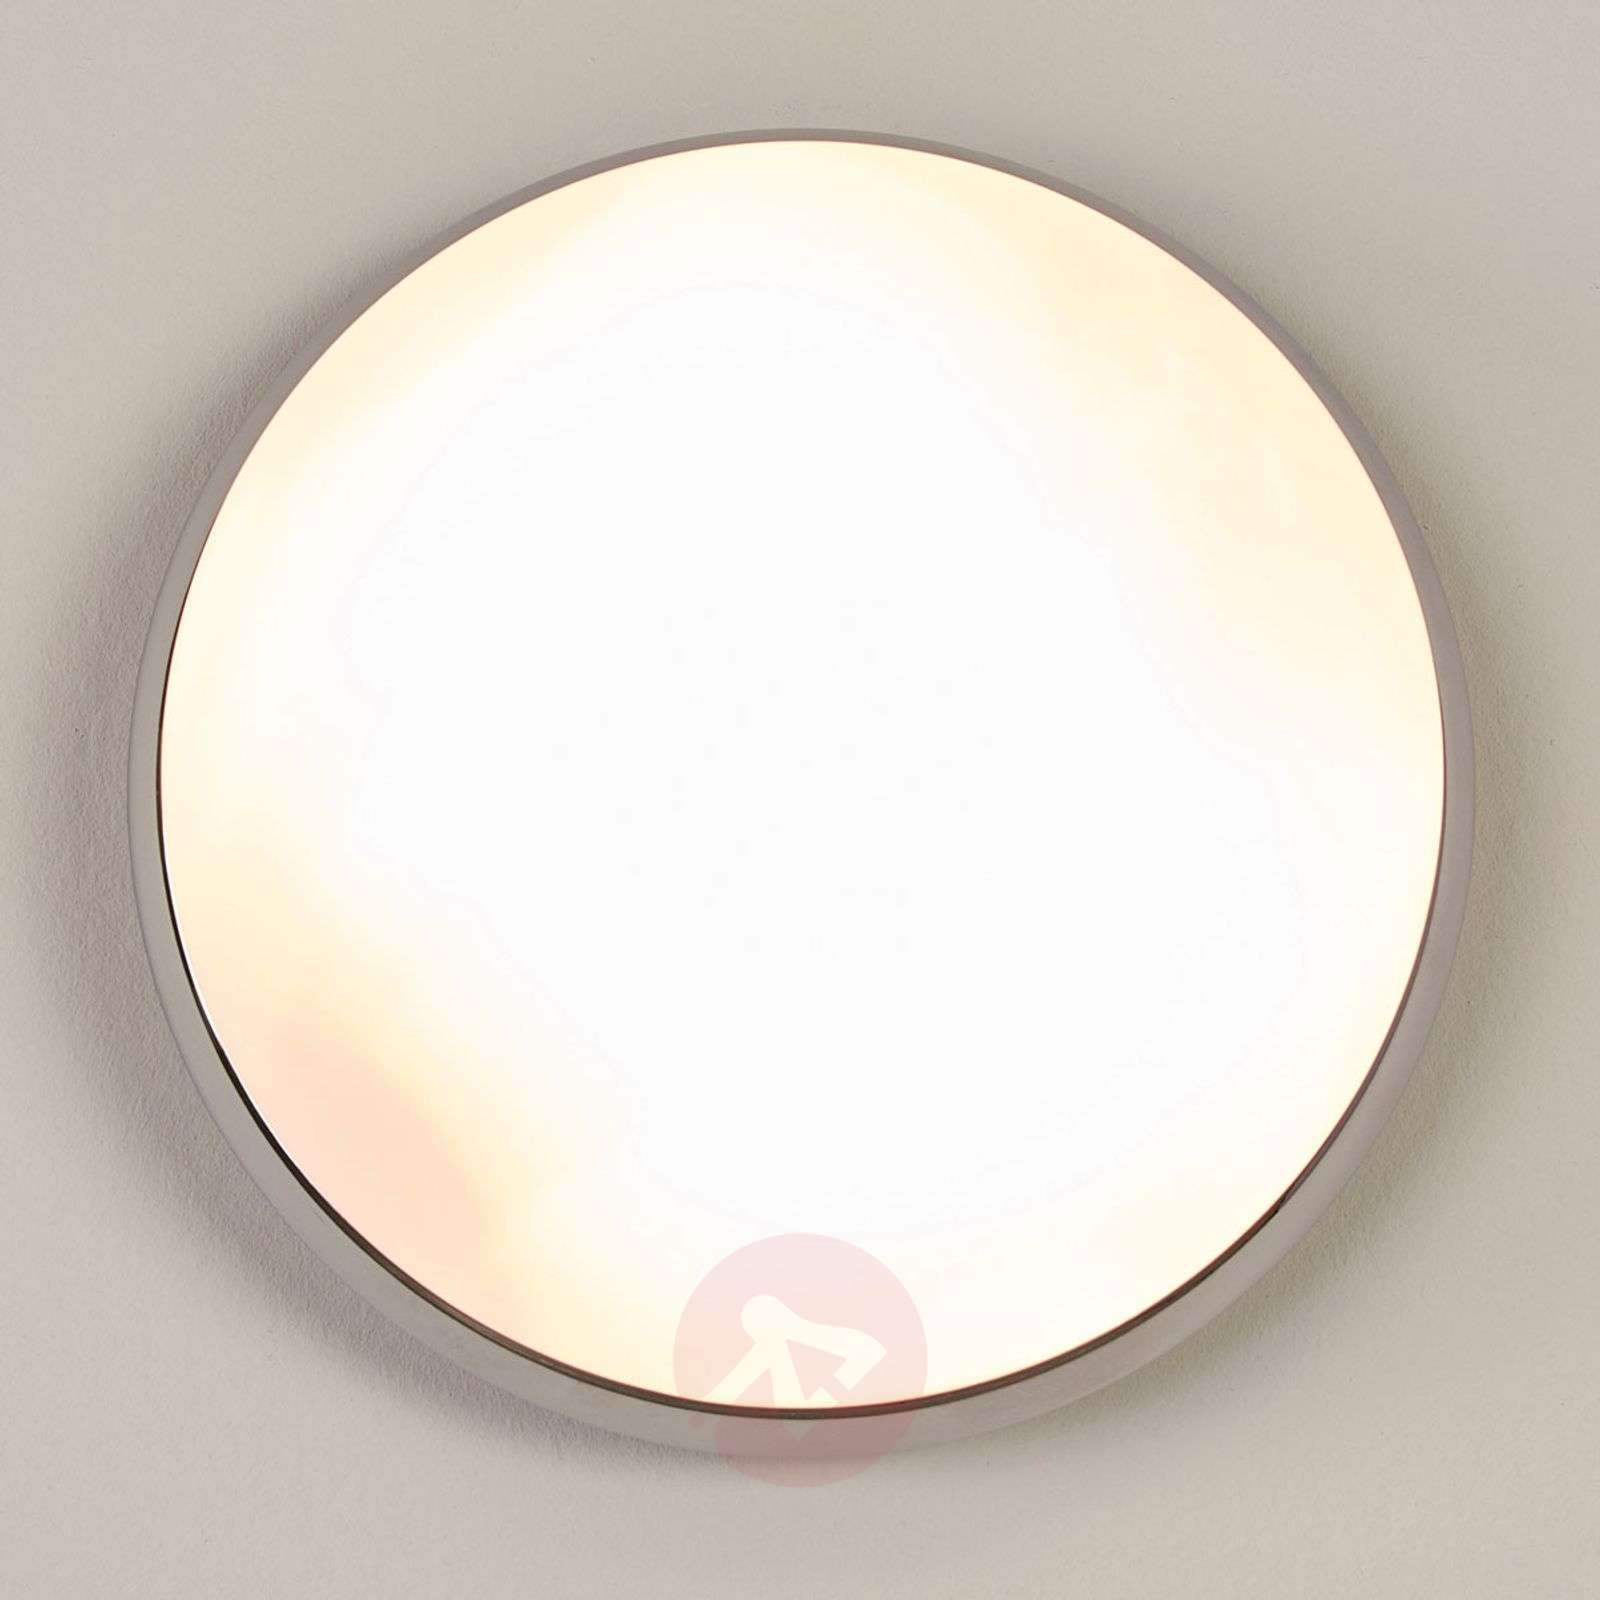 Bathroom ceiling light Mijo with chrome rim, IP44-9641092-05